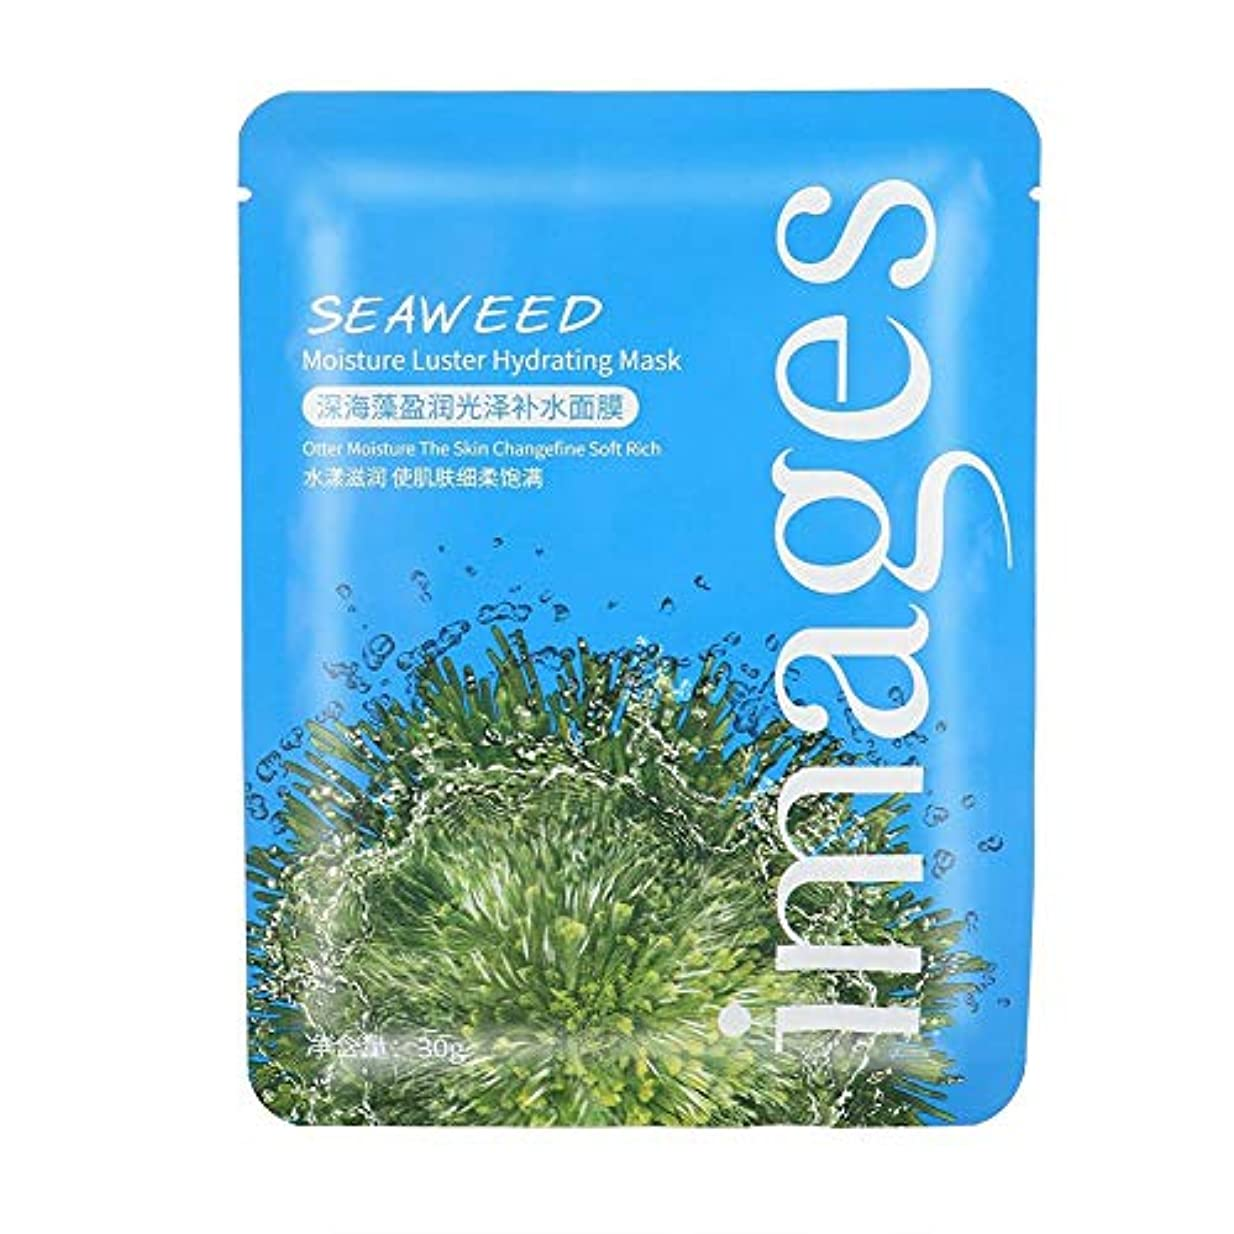 Semme天然海藻エキスフェイスマスク、20 /個明るく保湿引き締め海藻エッセンスフルフェイスフェイシャルマスクシートスキンケア(豊かな輝き)